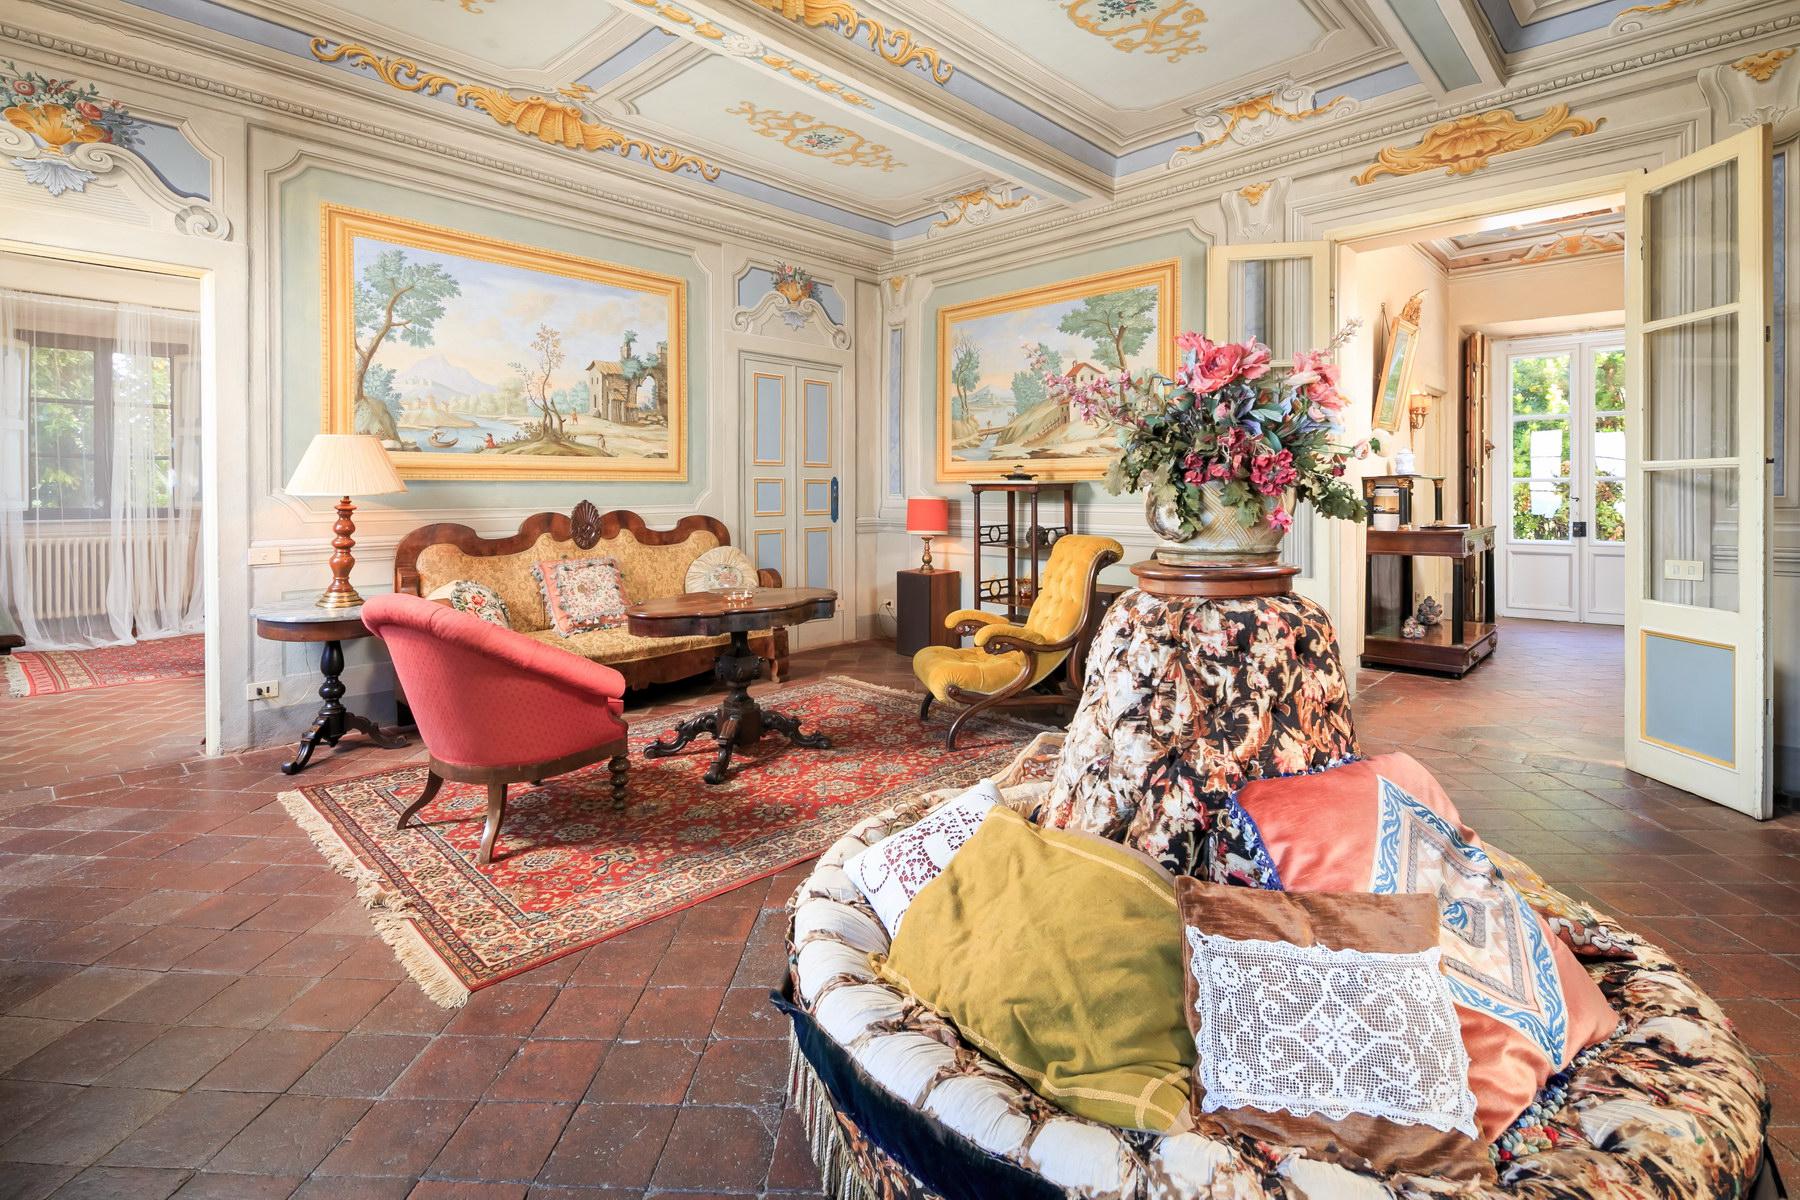 Villa in Vendita a Capannori: 5 locali, 570 mq - Foto 16